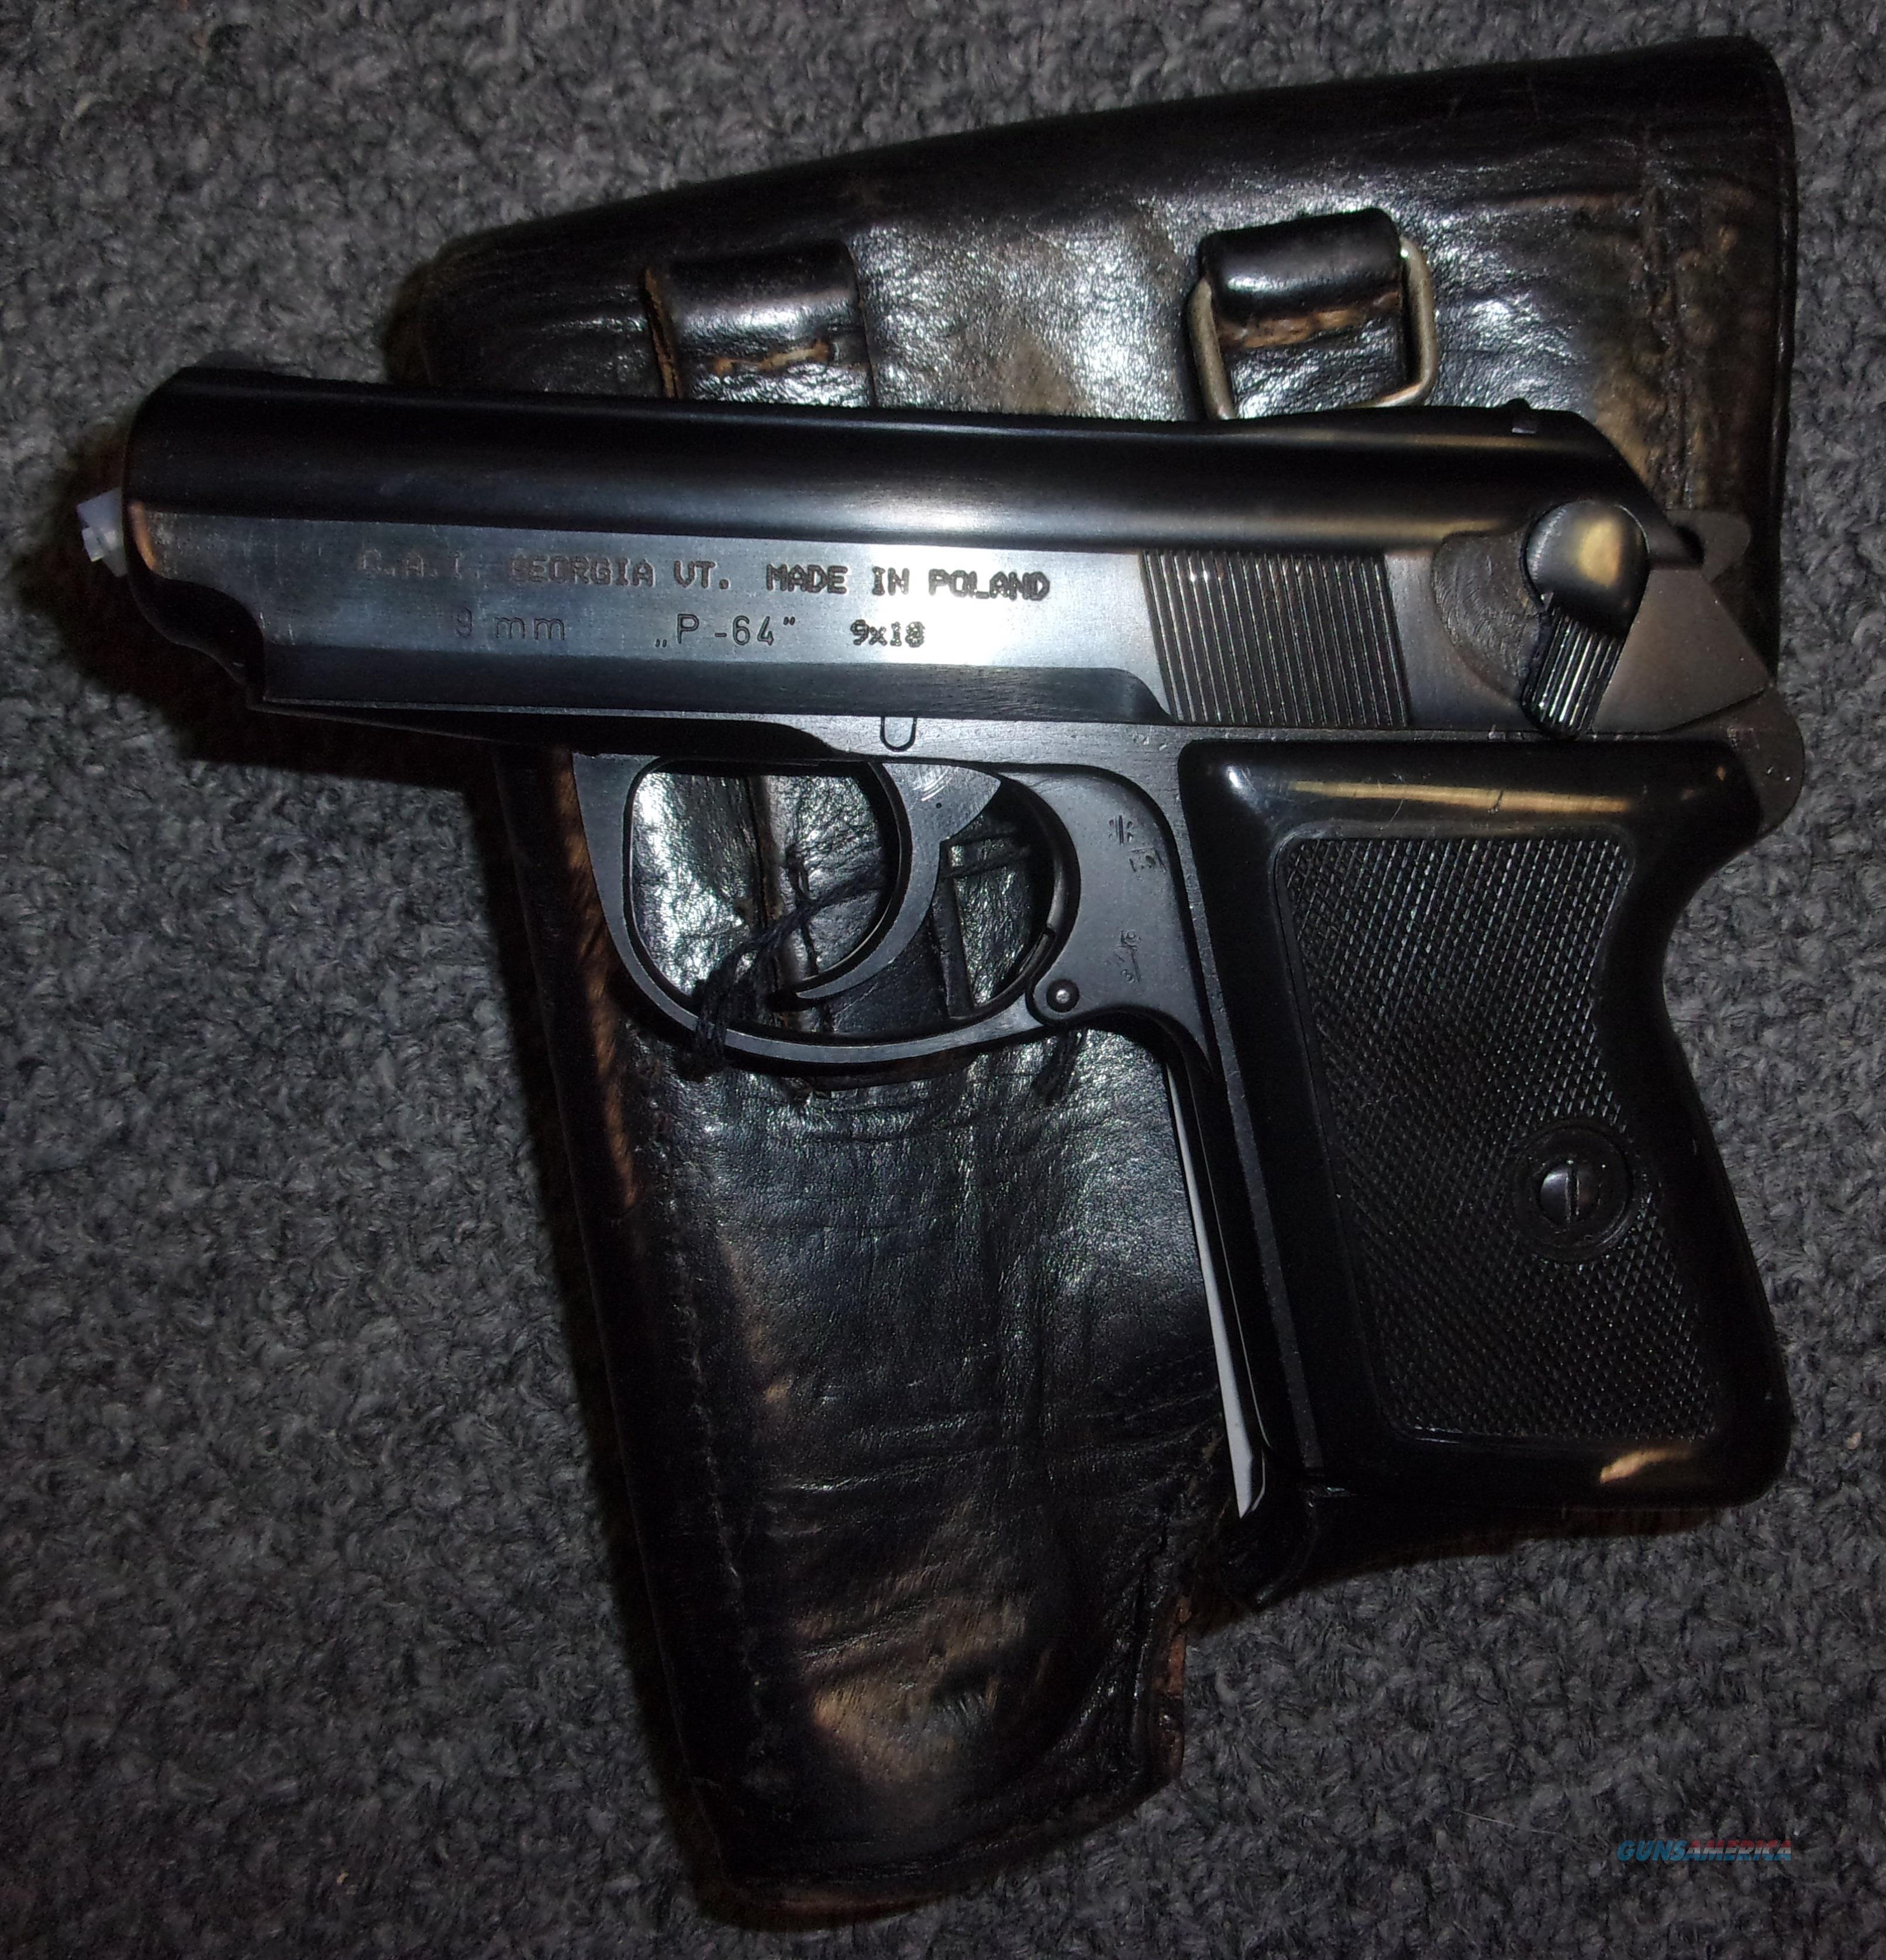 Polish/CAI P-64  Guns > Pistols > Century International Arms - Pistols > Pistols